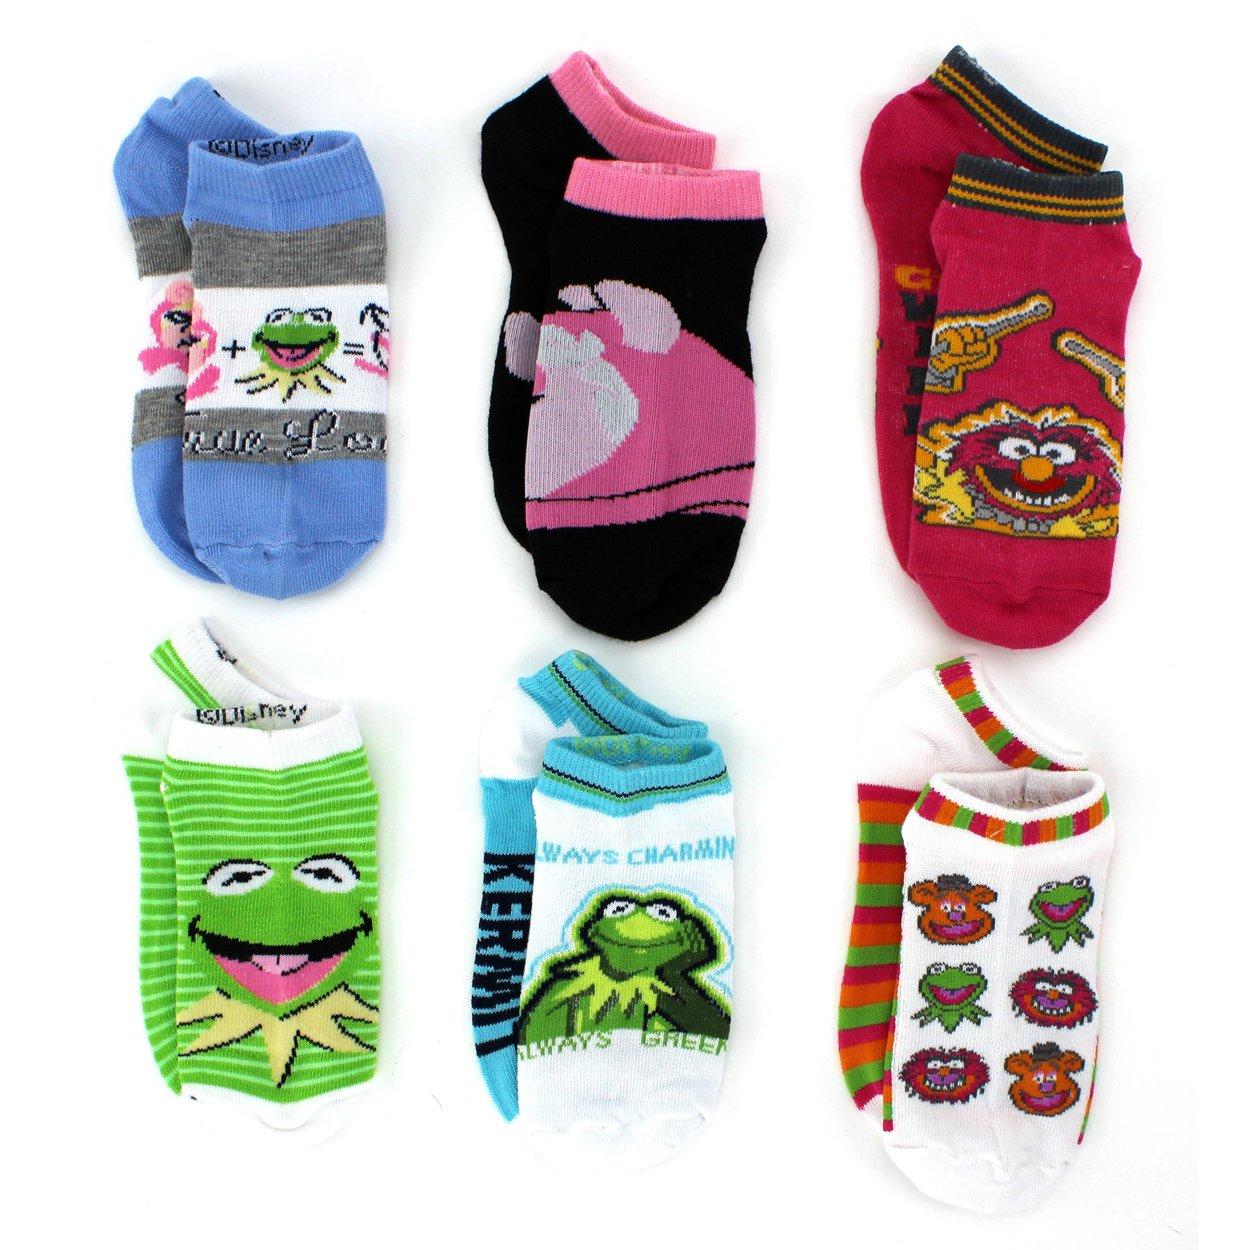 The Muppets Girls 6 pack Socks (Little Kid/Big Kid) True Love No Show) manufacturer 00-AVHSF3AD-UZ